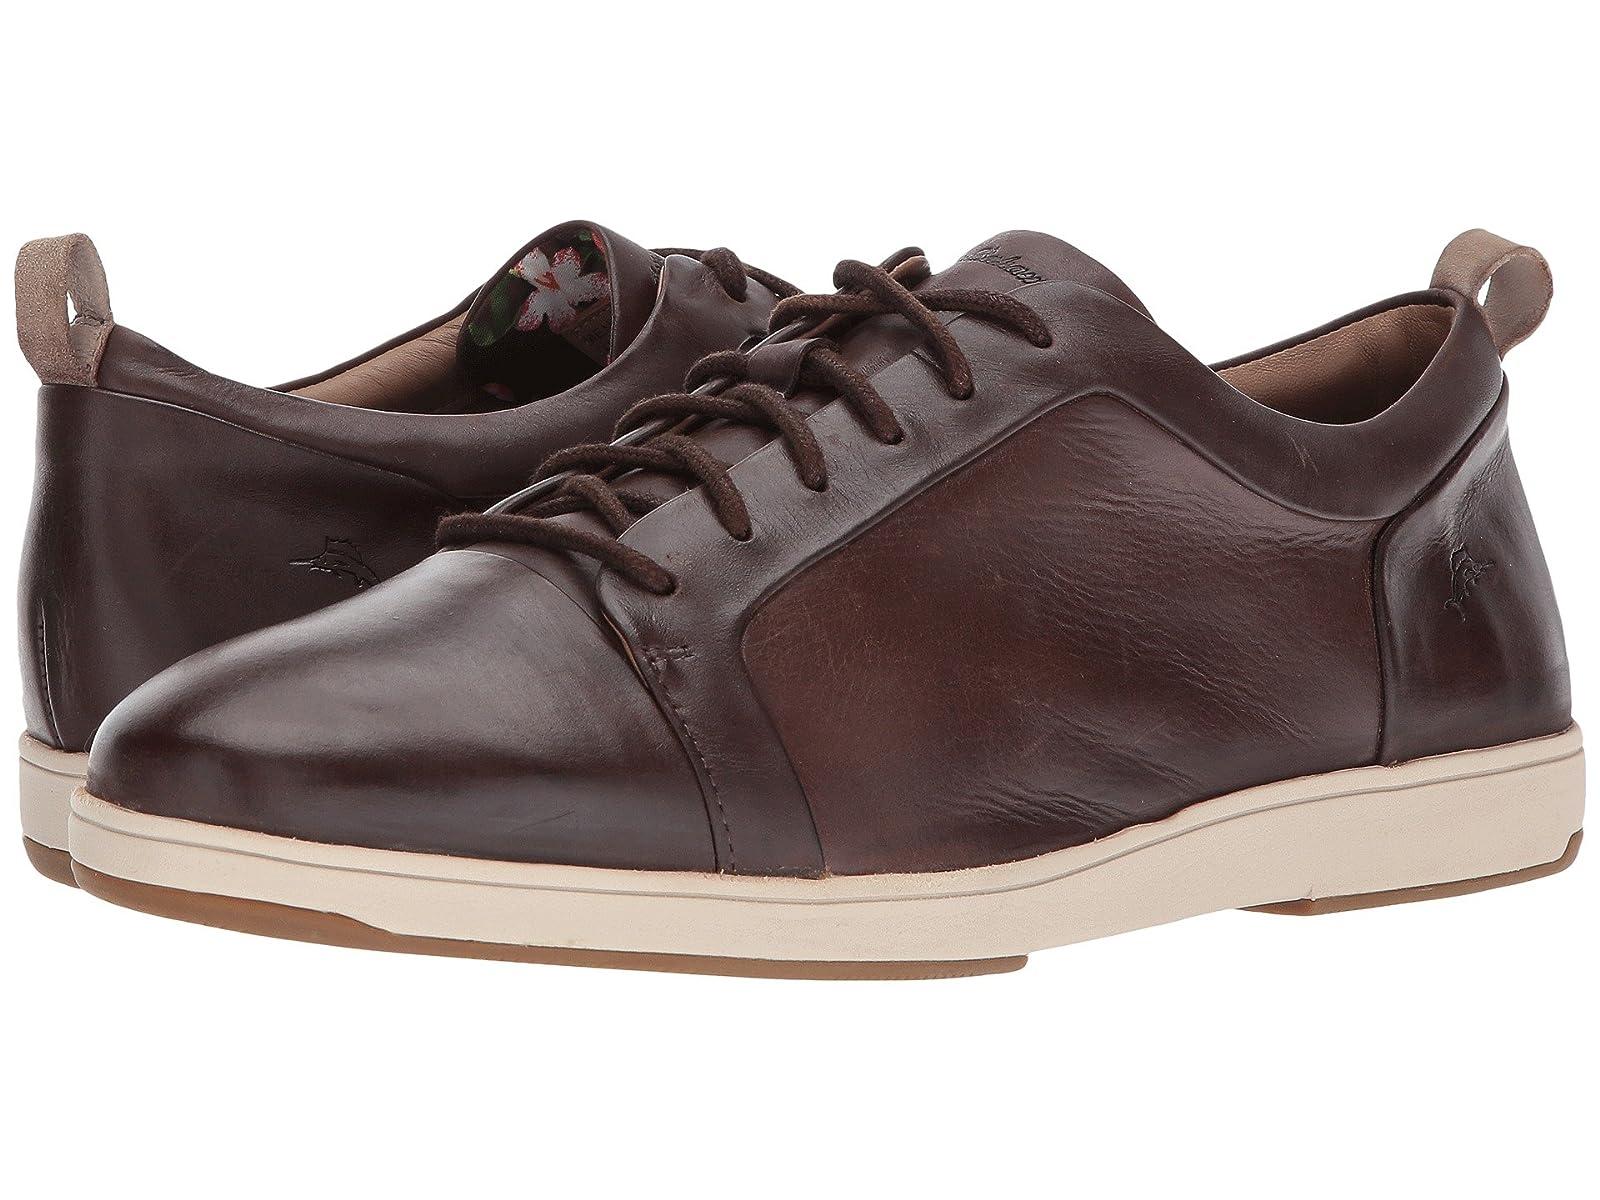 Tommy Bahama Relaxology Cadiz TilesCheap and distinctive eye-catching shoes